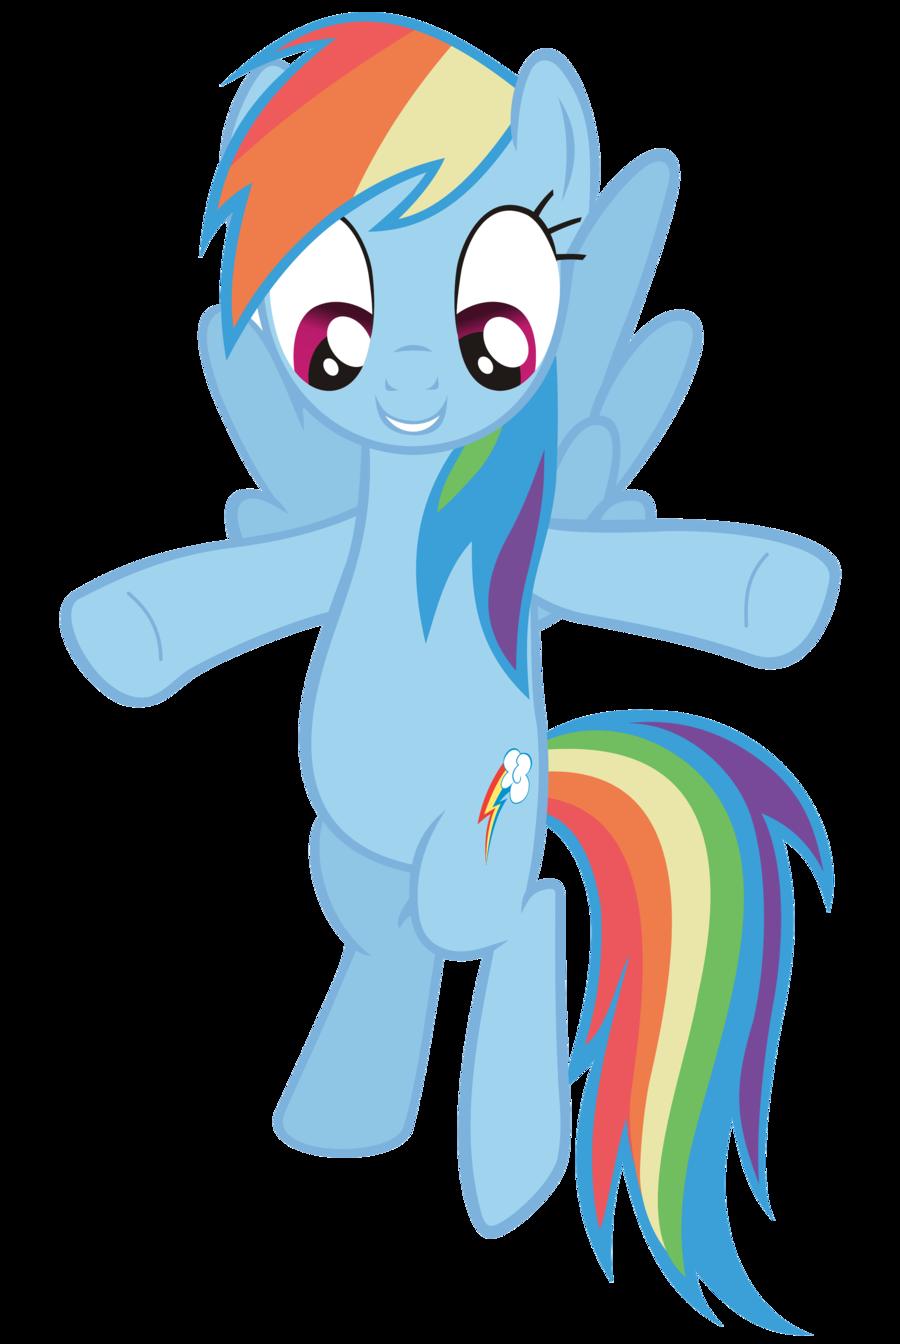 261209a4d34 Happy Rainbow Dash. Hasbro My Little Pony